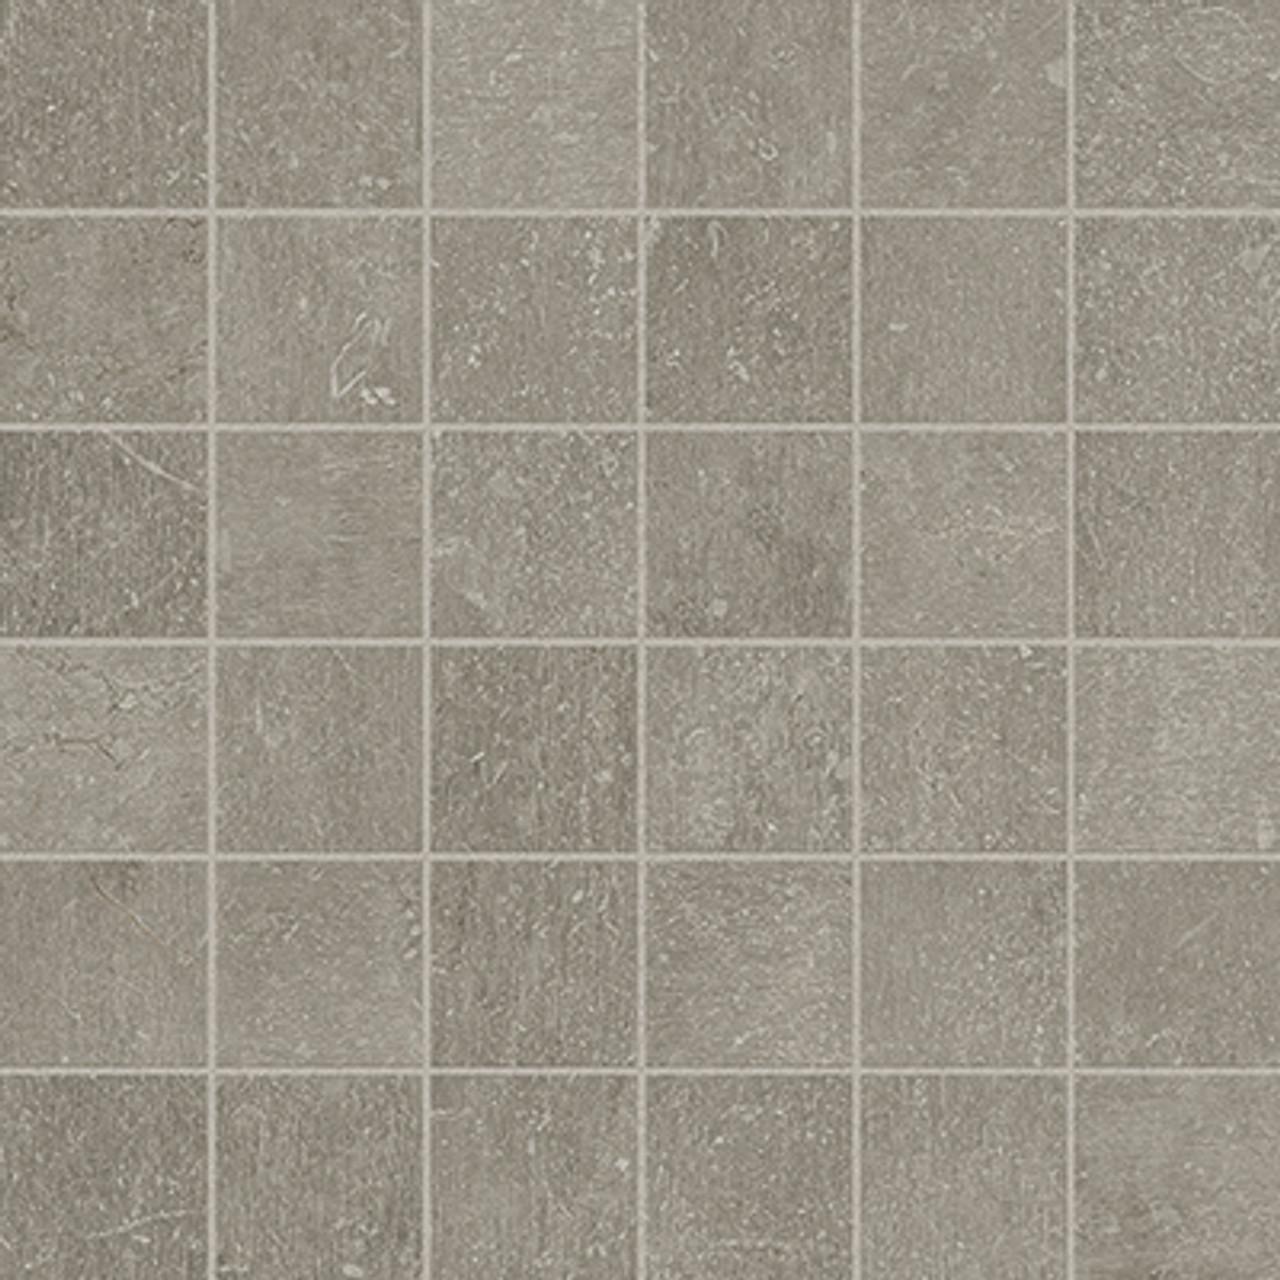 nexus clay hd mosaics 2x2